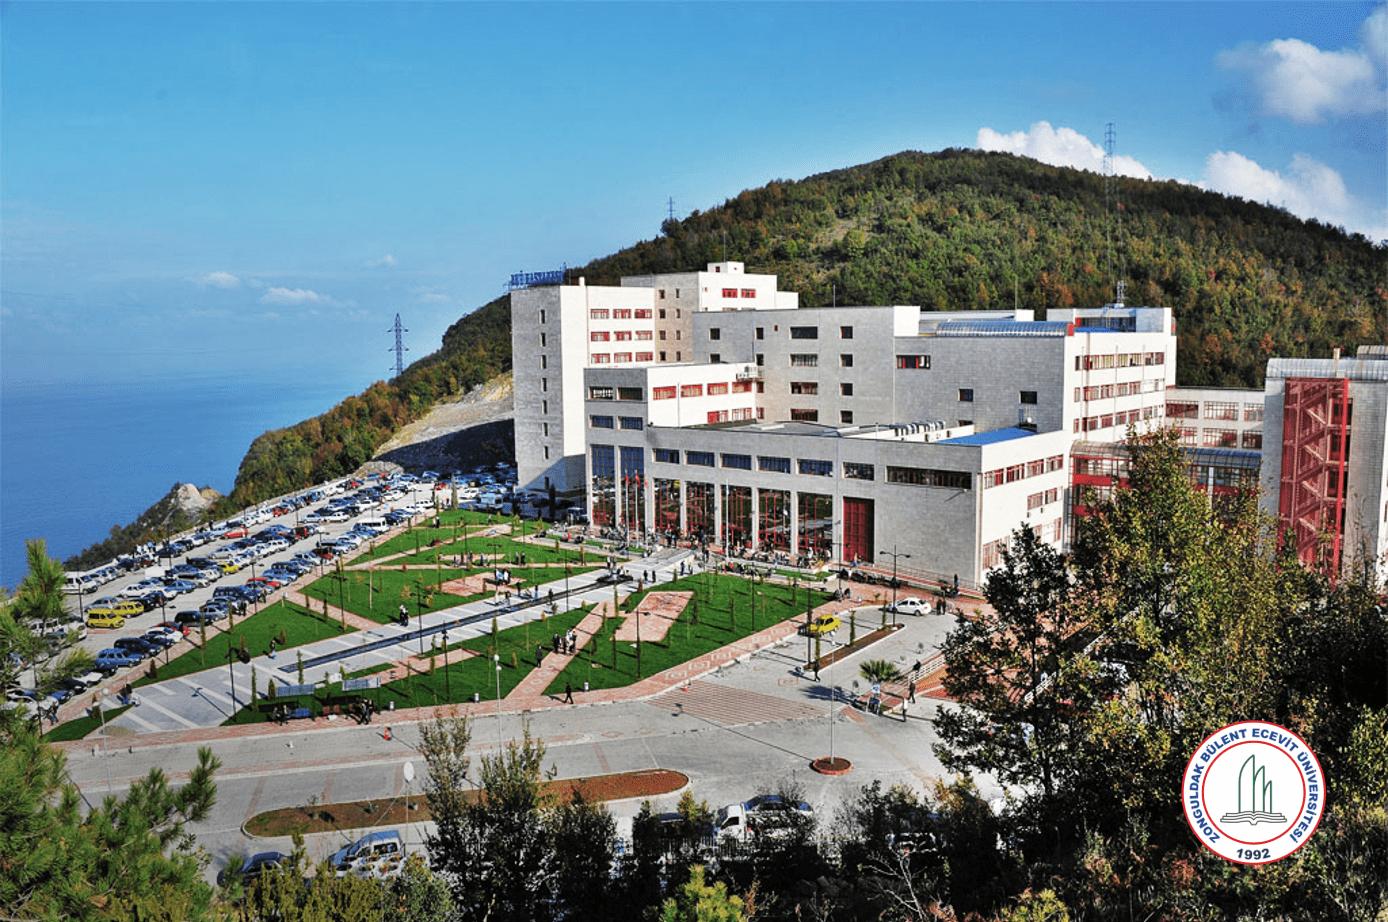 www.podolojiturkiye.org